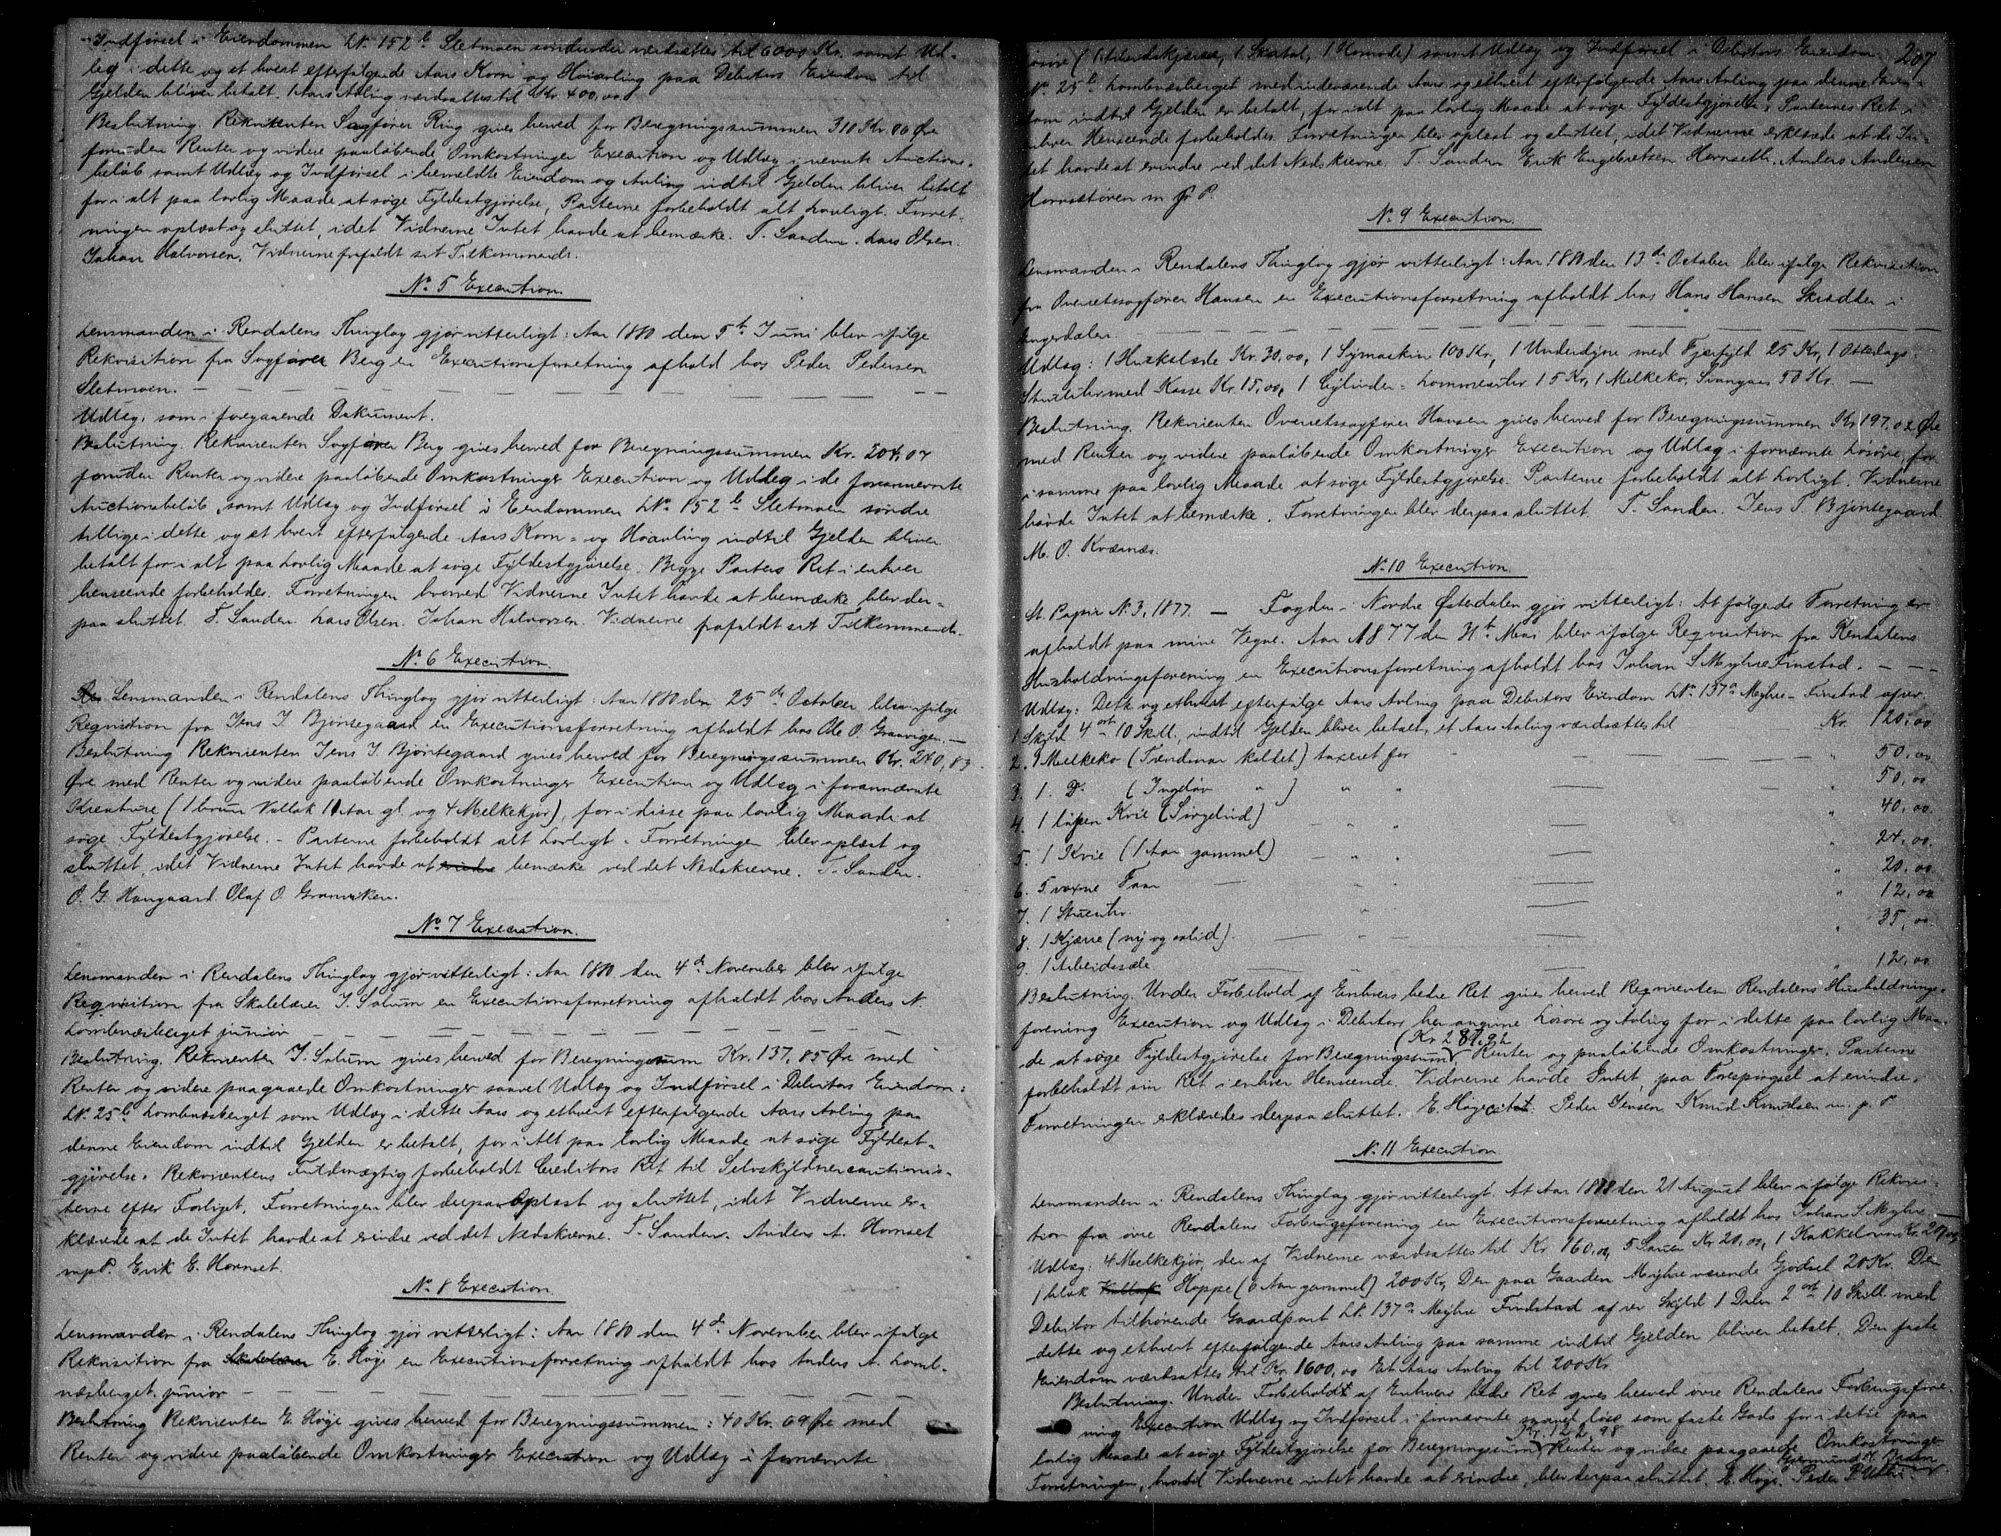 SAH, Nord-Østerdal tingrett, H/Hb/Hba/L0009: Pantebok nr. 9, 1879-1882, s. 207